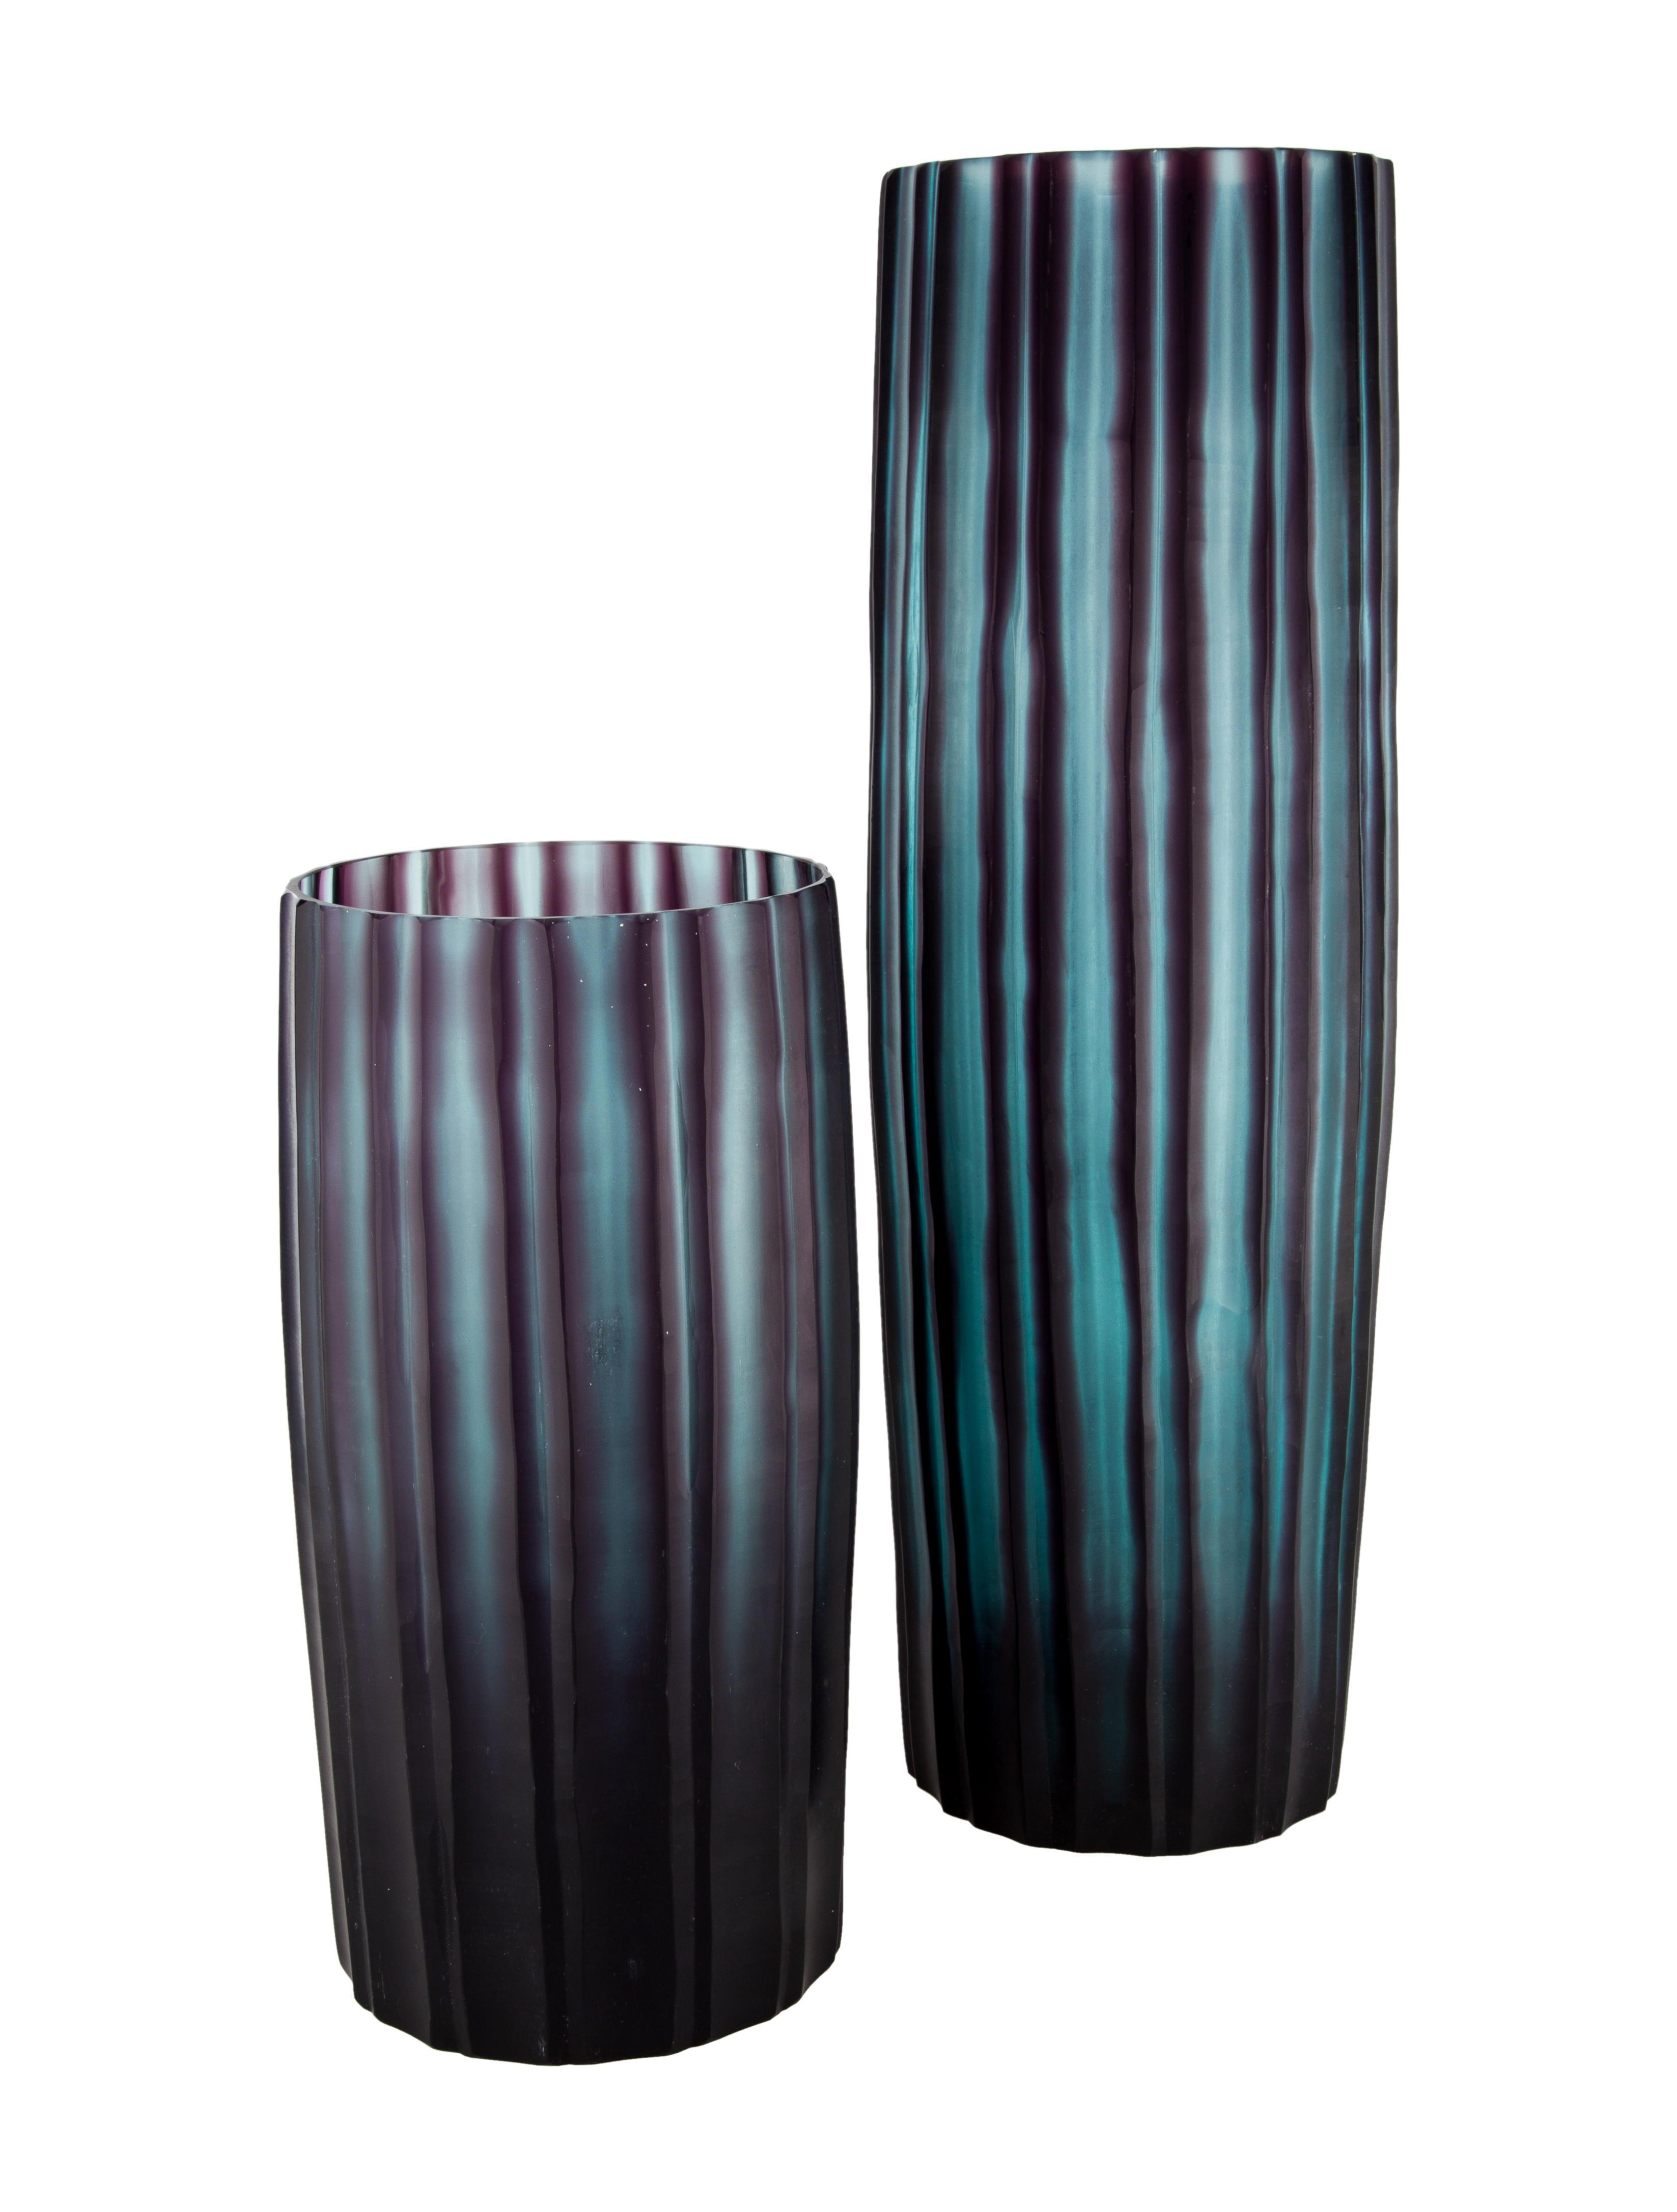 Ligne Roset Licorice Vases Decor And Accessories